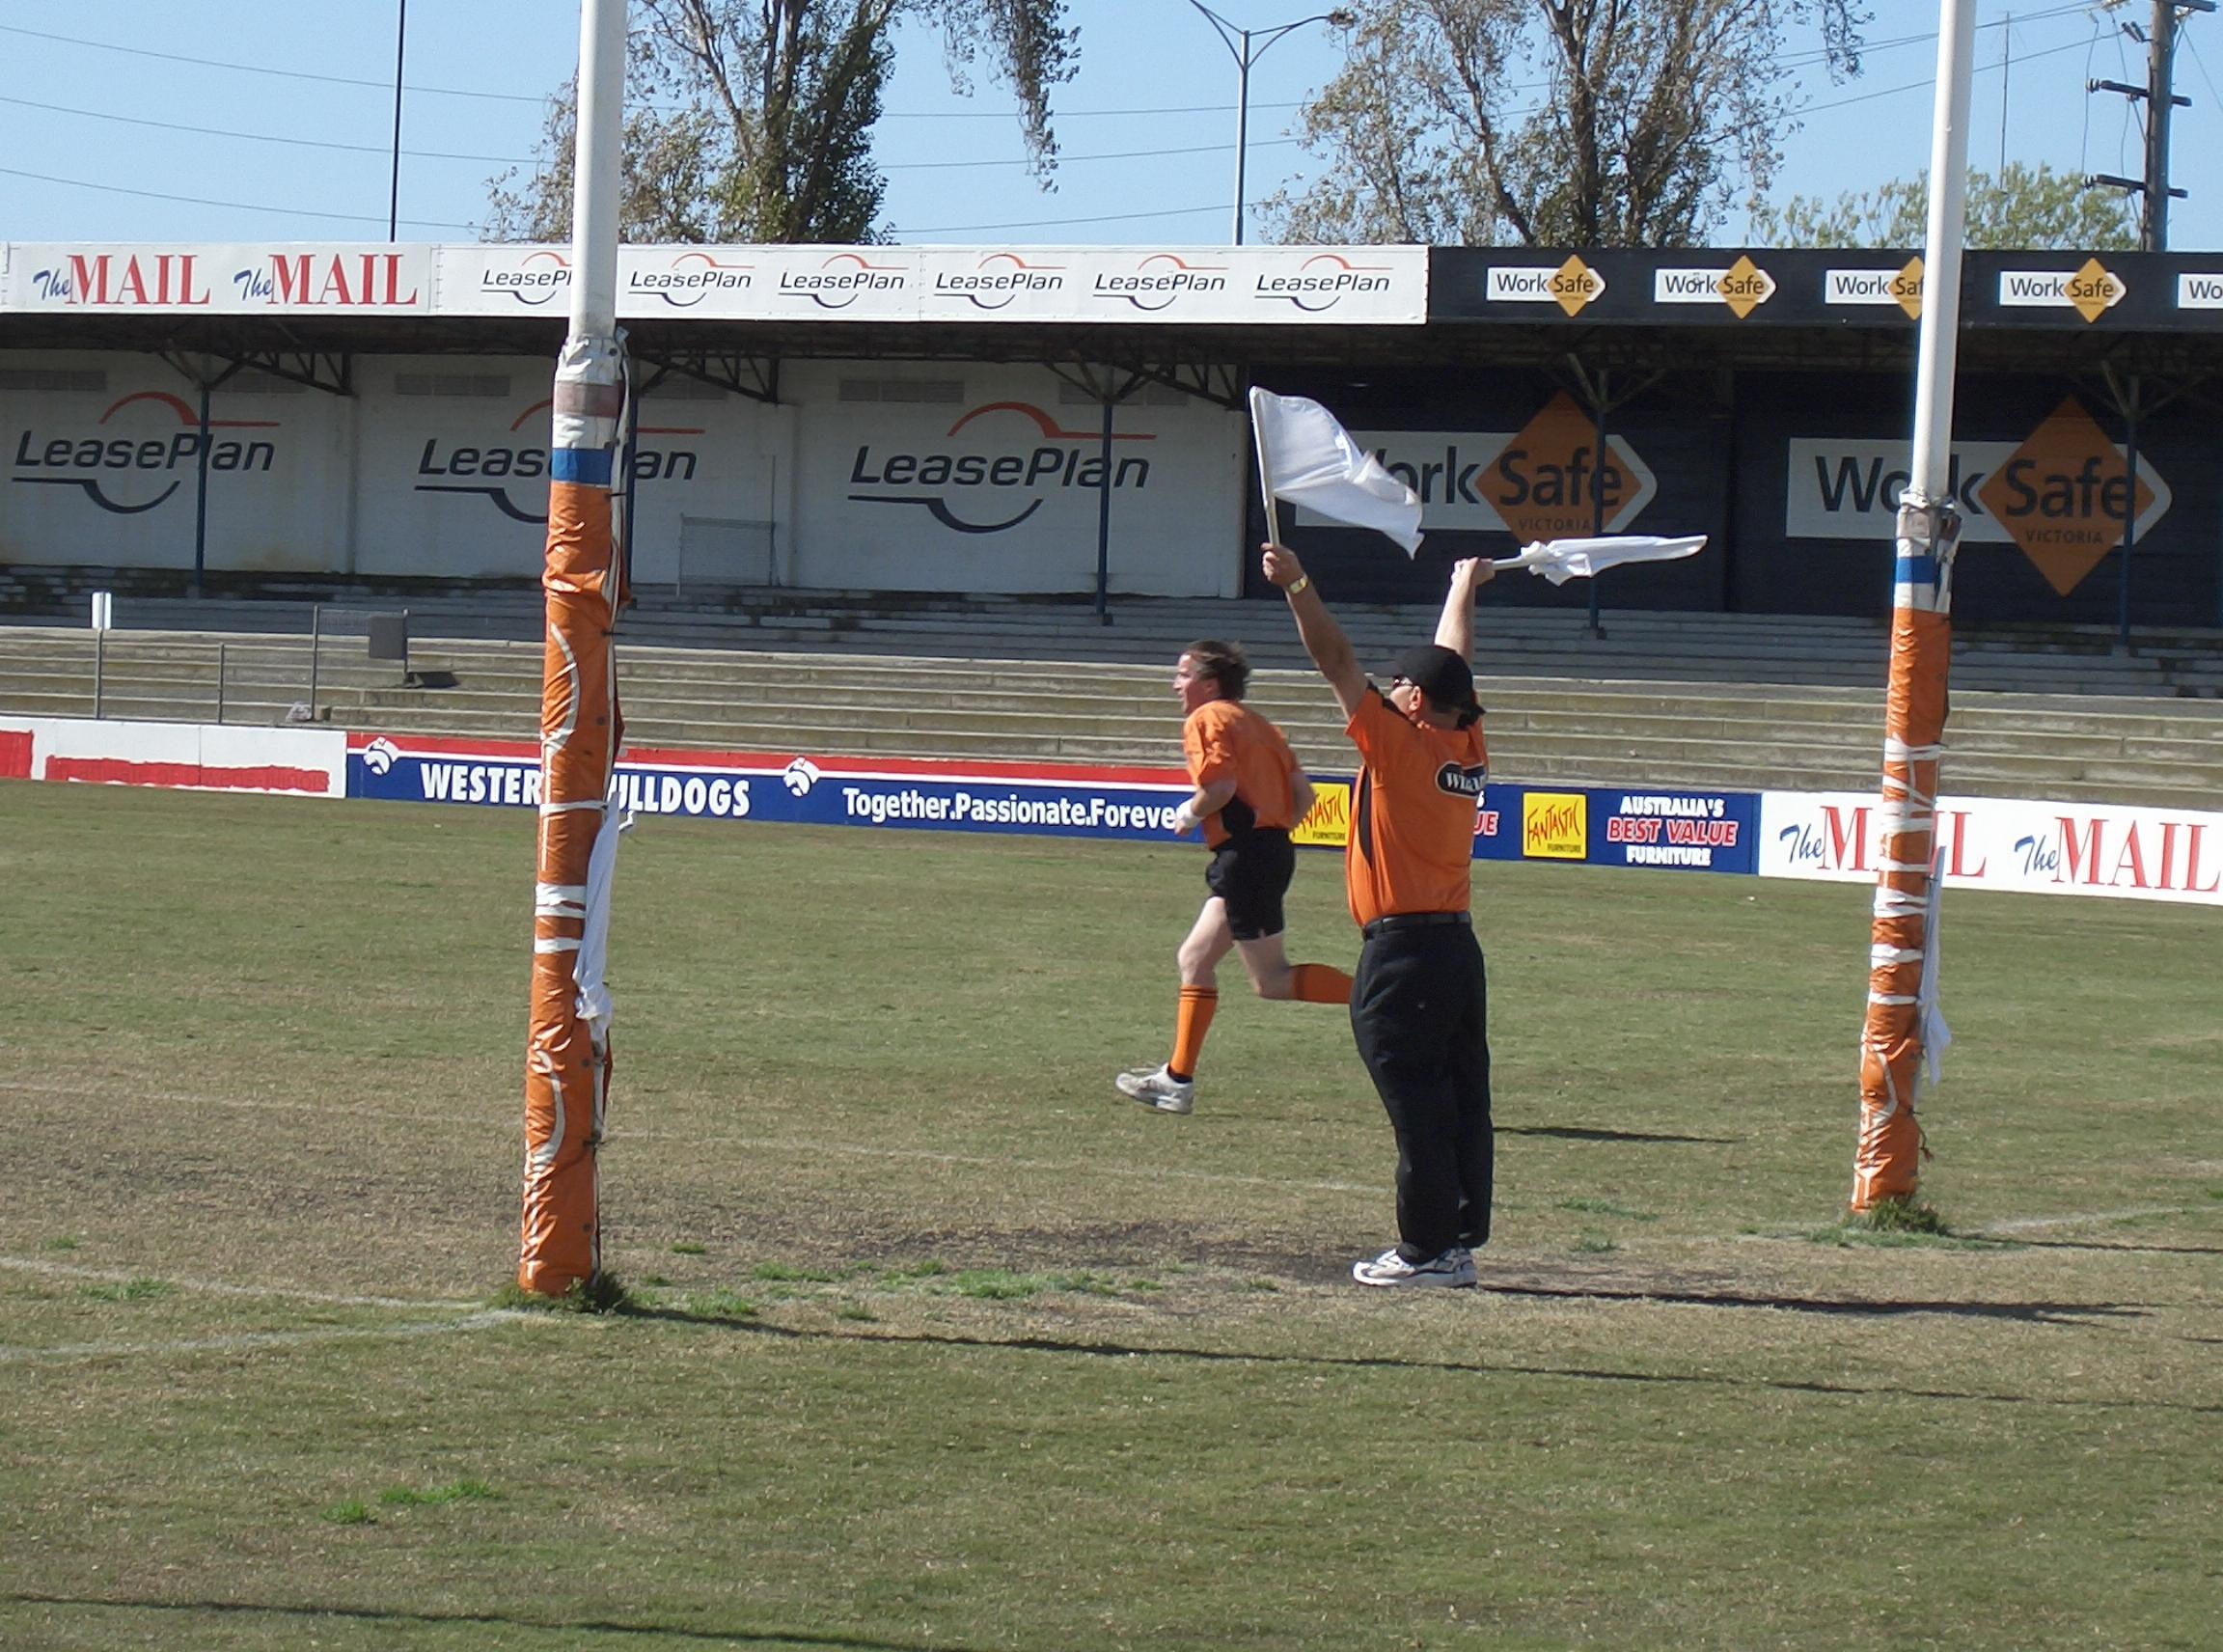 Umpire (Australian rules football) - Wikipedia